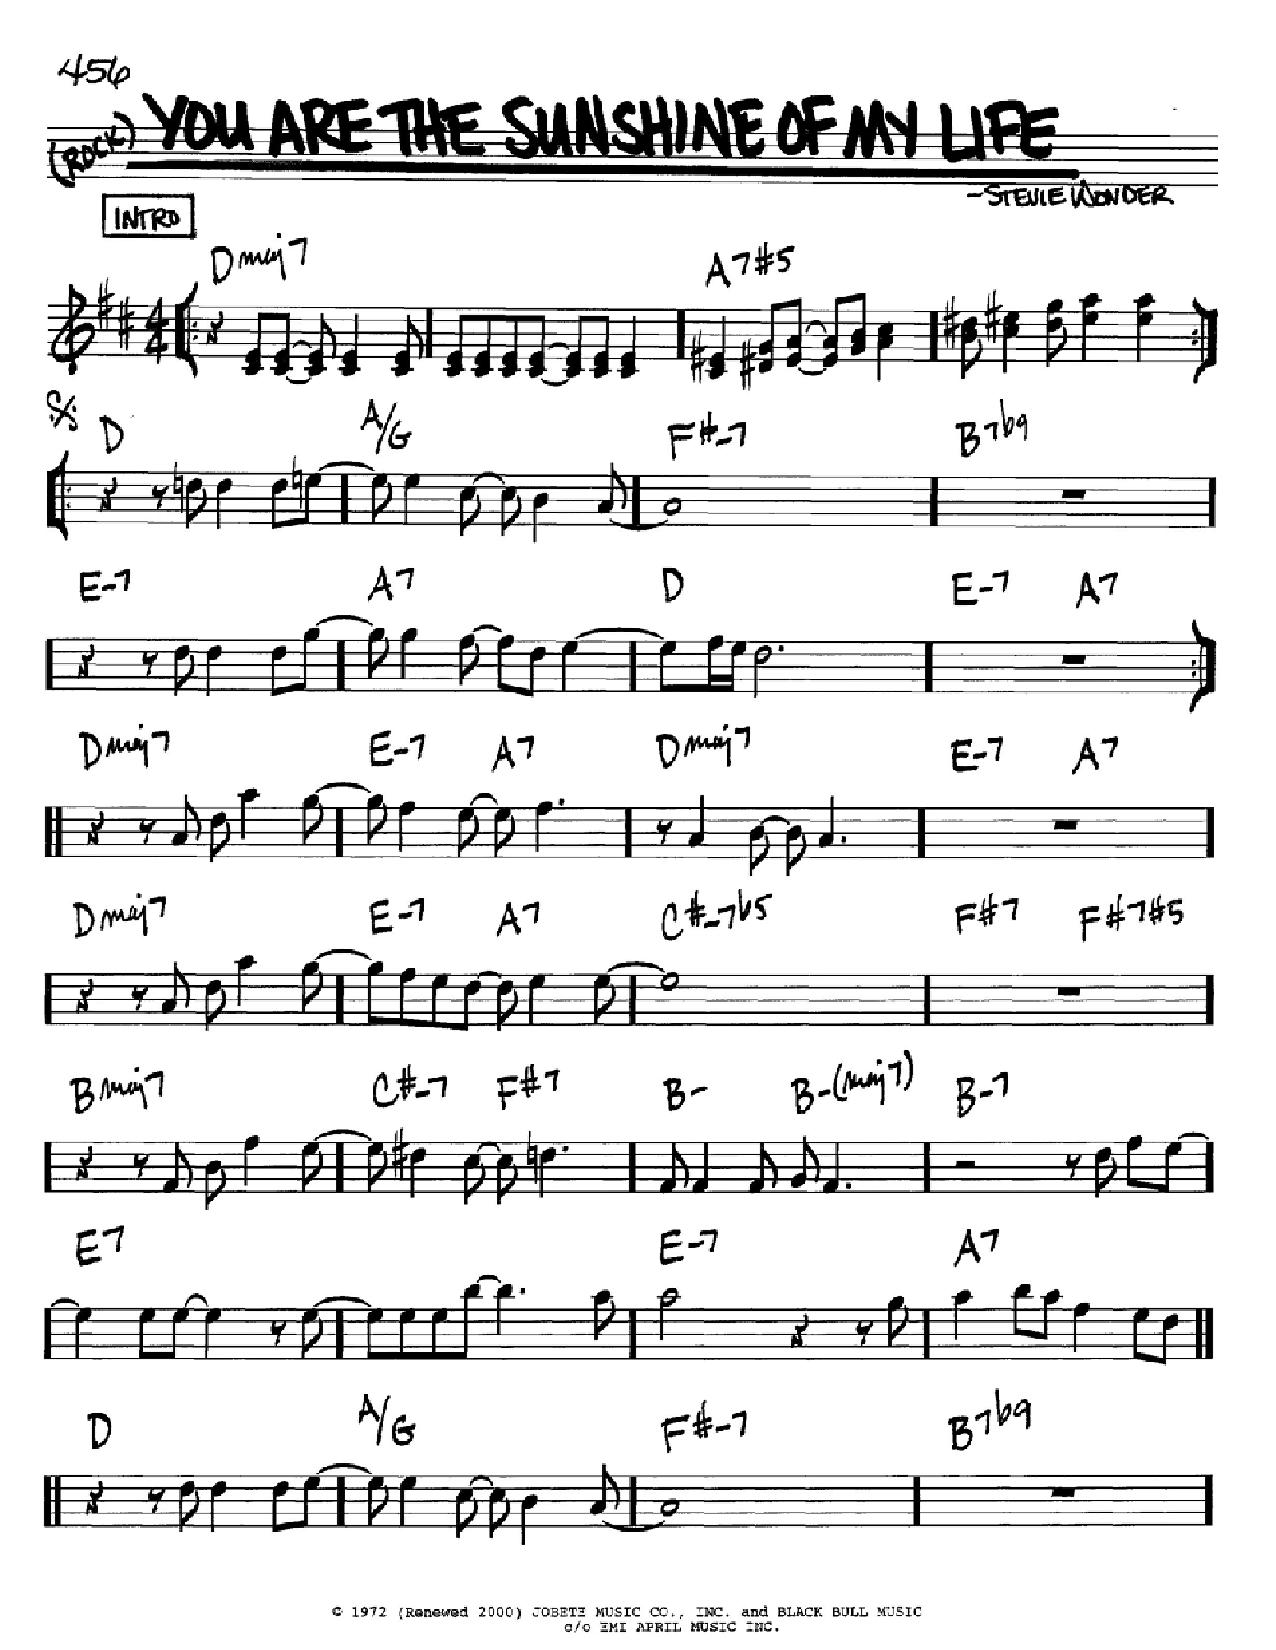 Partition autre You Are The Sunshine Of My Life de Stevie Wonder - Real Book, Melodie et Accords, Inst. En Sib